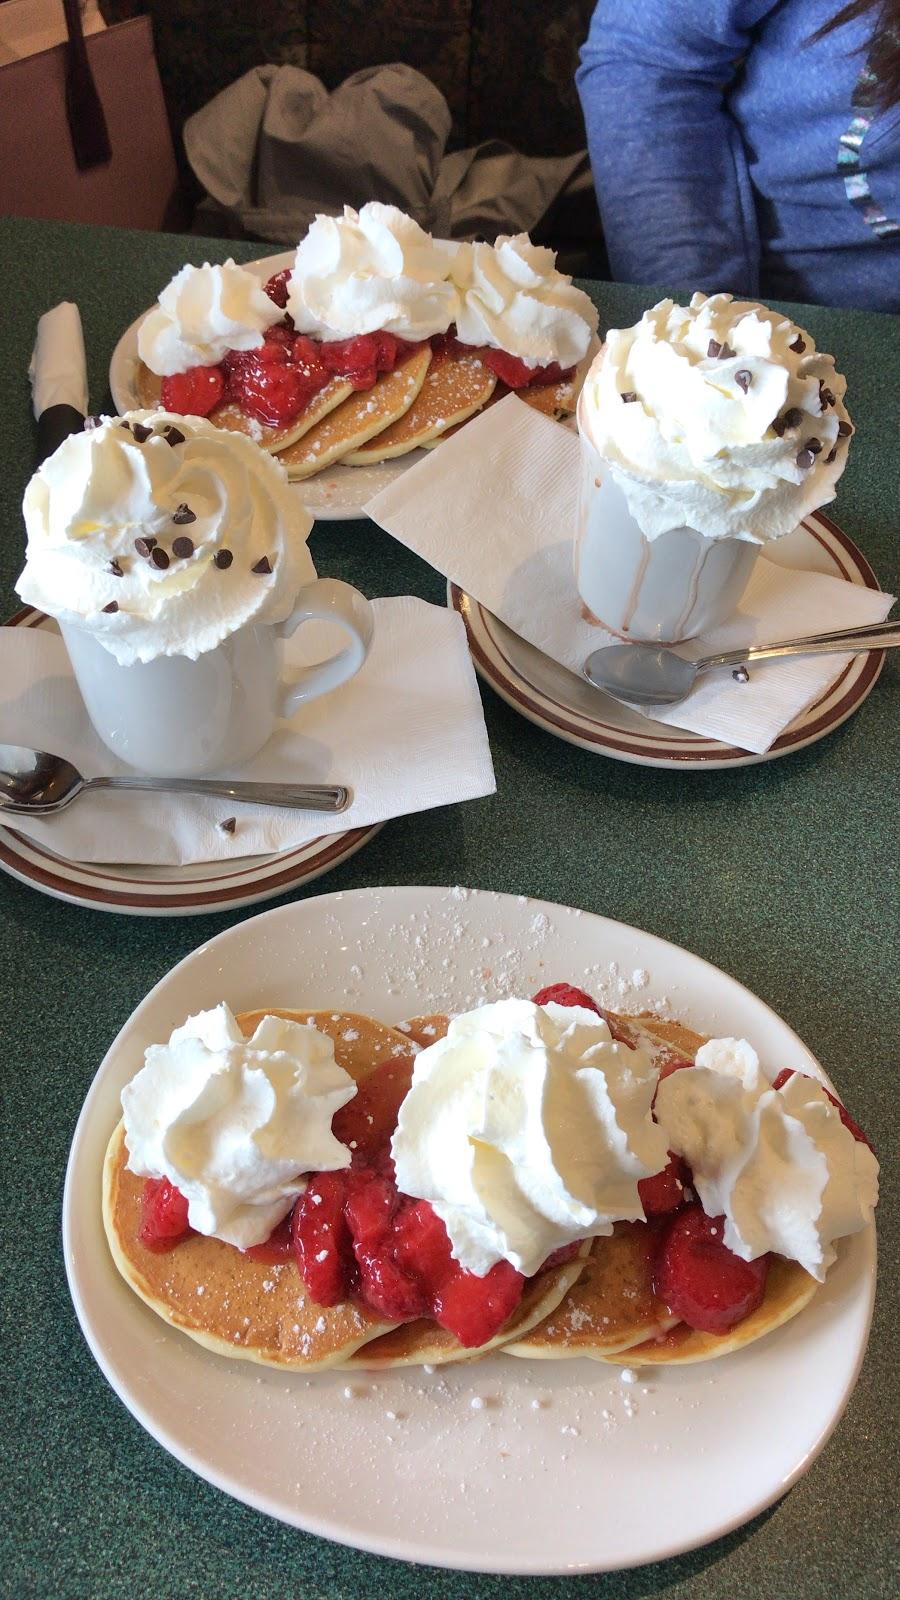 The Original Pancake House | restaurant | 1049 Pembina Hwy, Winnipeg, MB R3T 1Z6, Canada | 2044521040 OR +1 204-452-1040